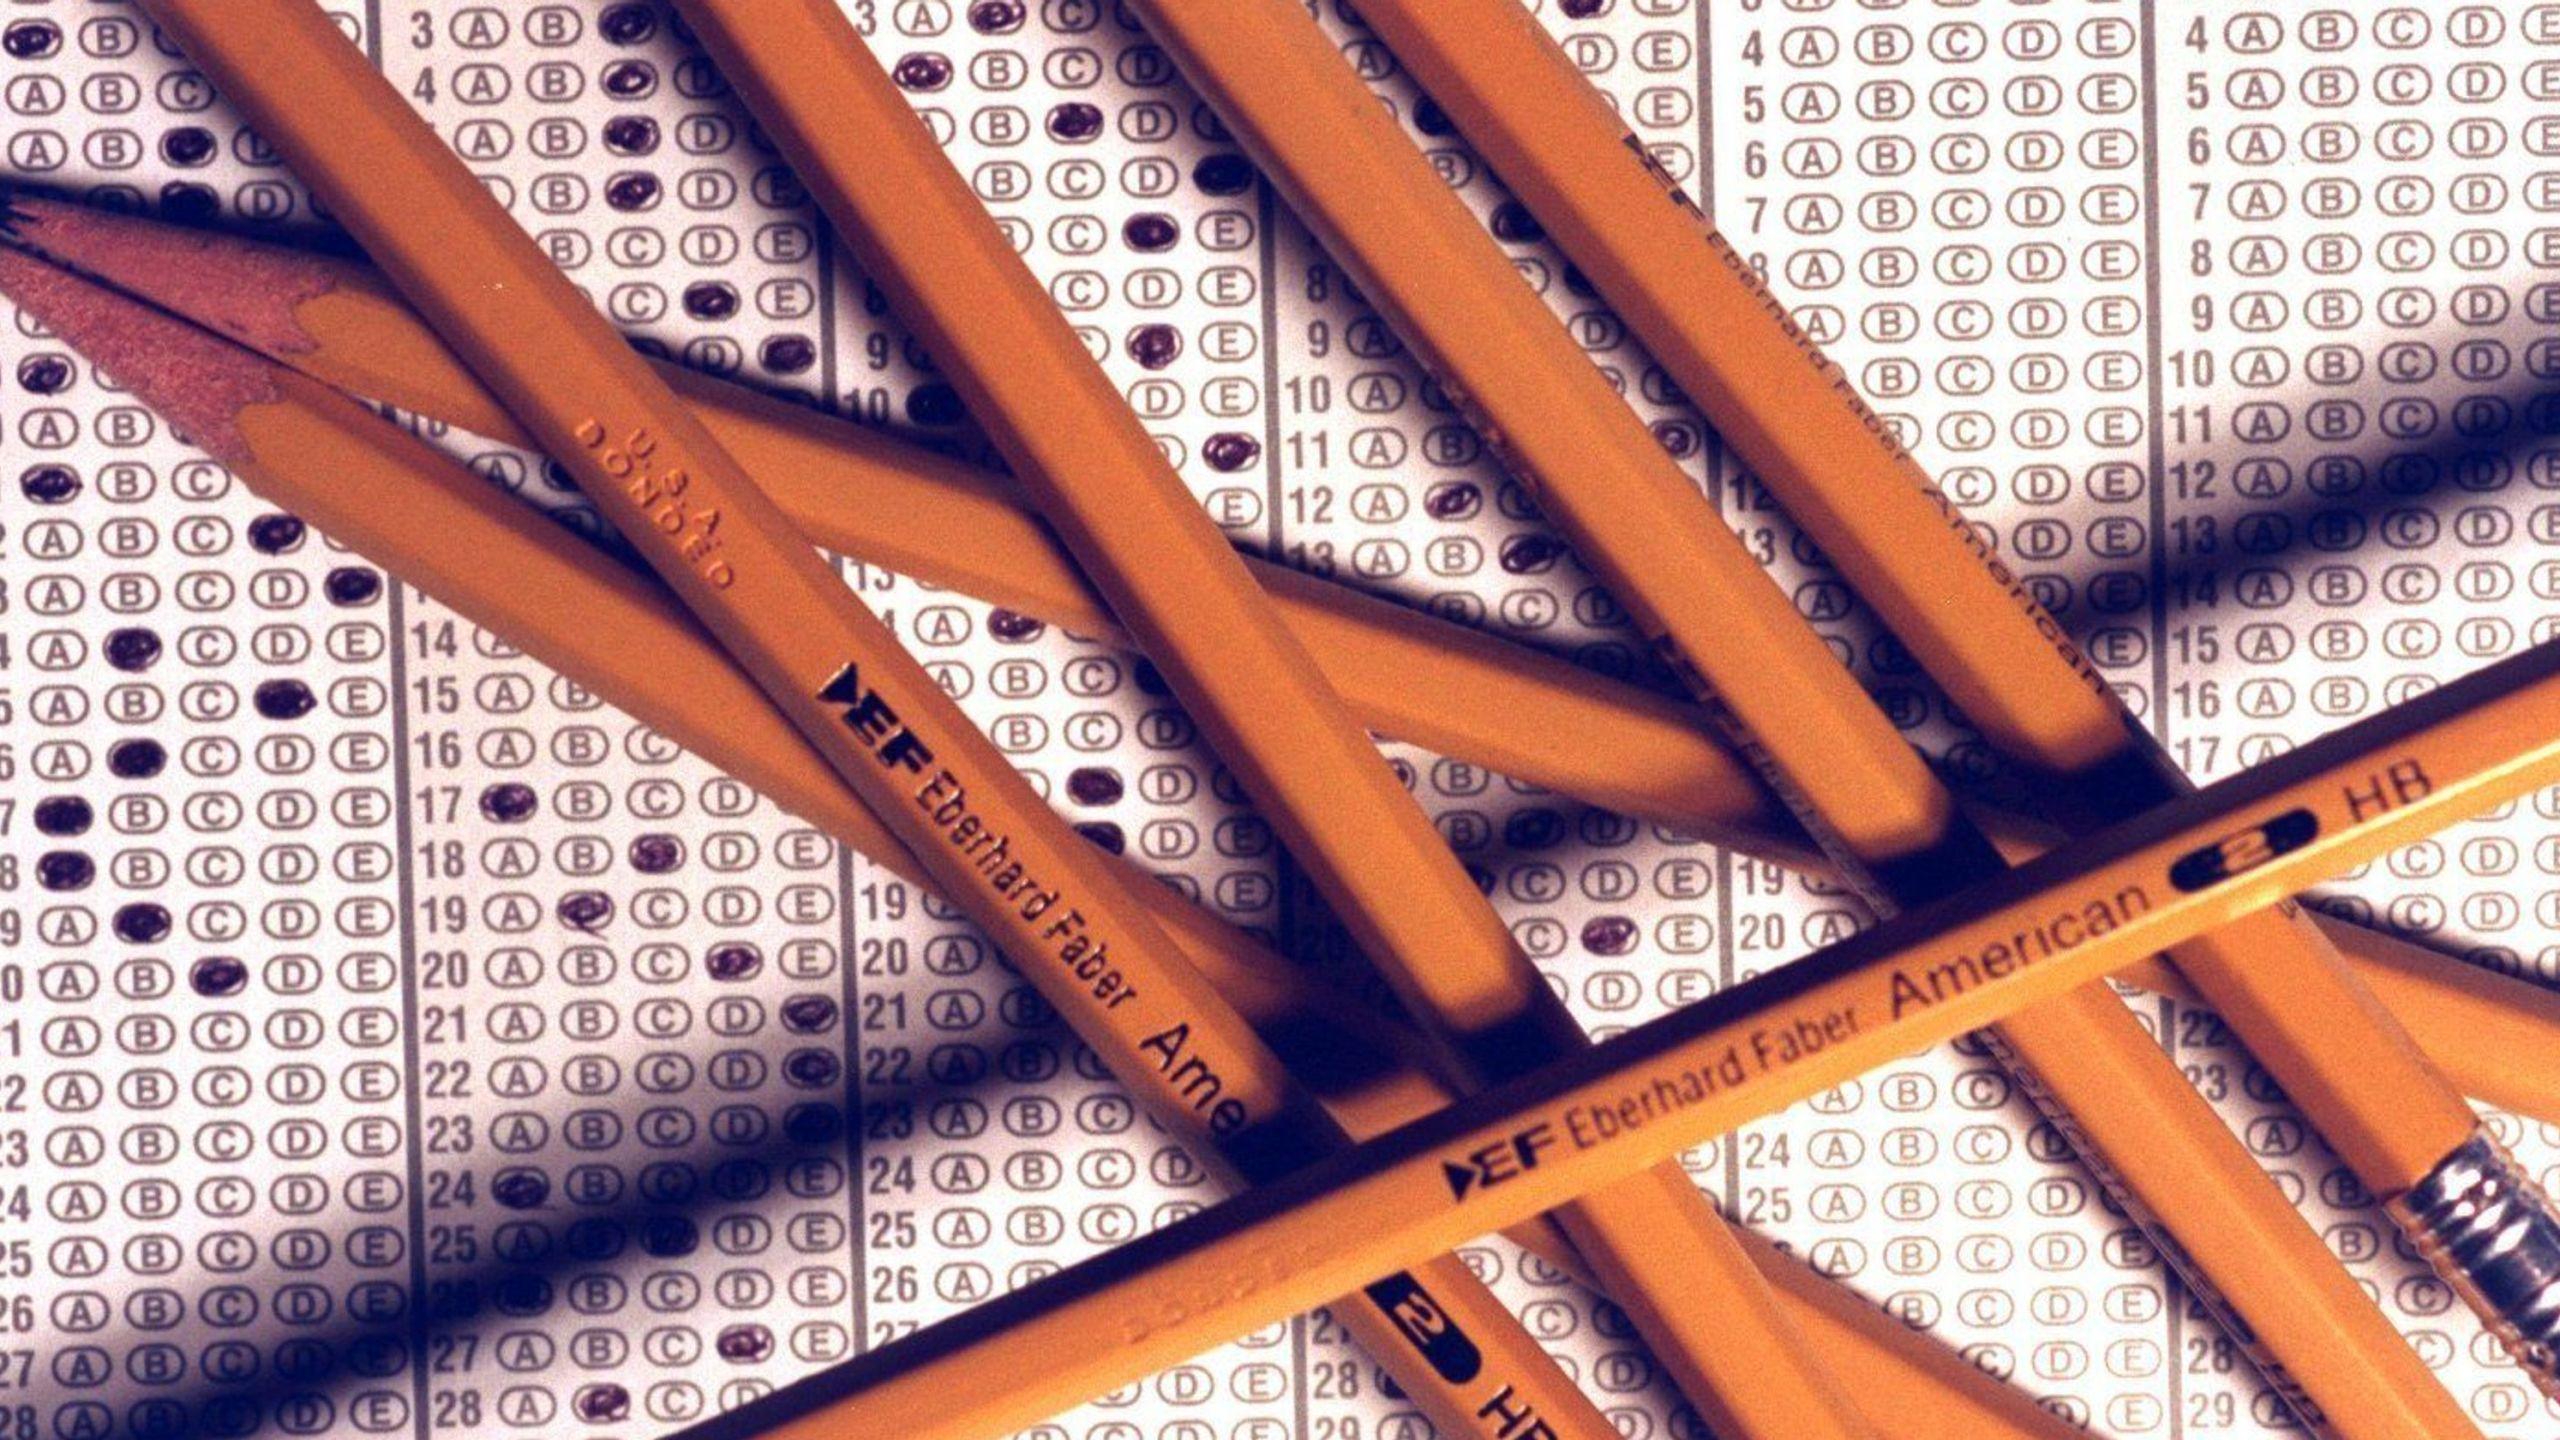 Pencils_1531258234011.jpg